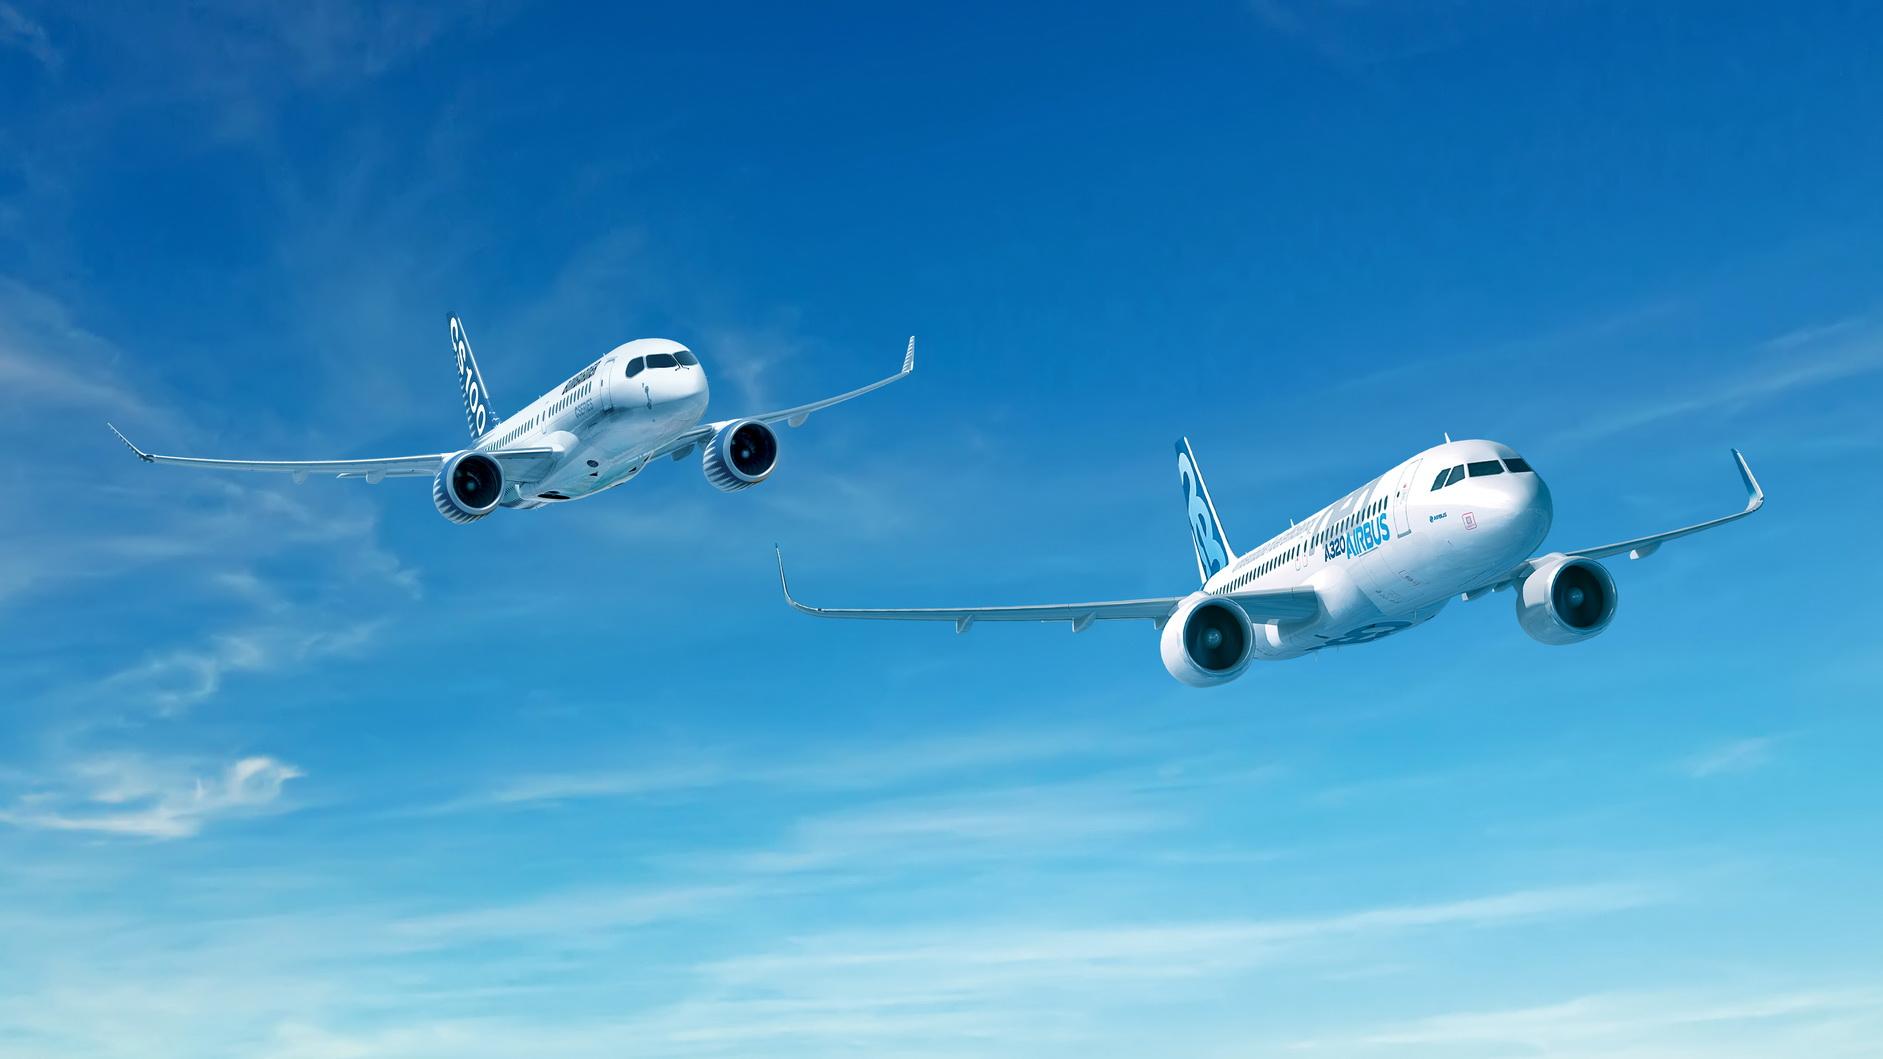 d4f18a50 9d9a 4aeb a5f4 c71cf141a103 - Что произойдет в результате соглашения между Airbus и Bombardier по программе CSeries